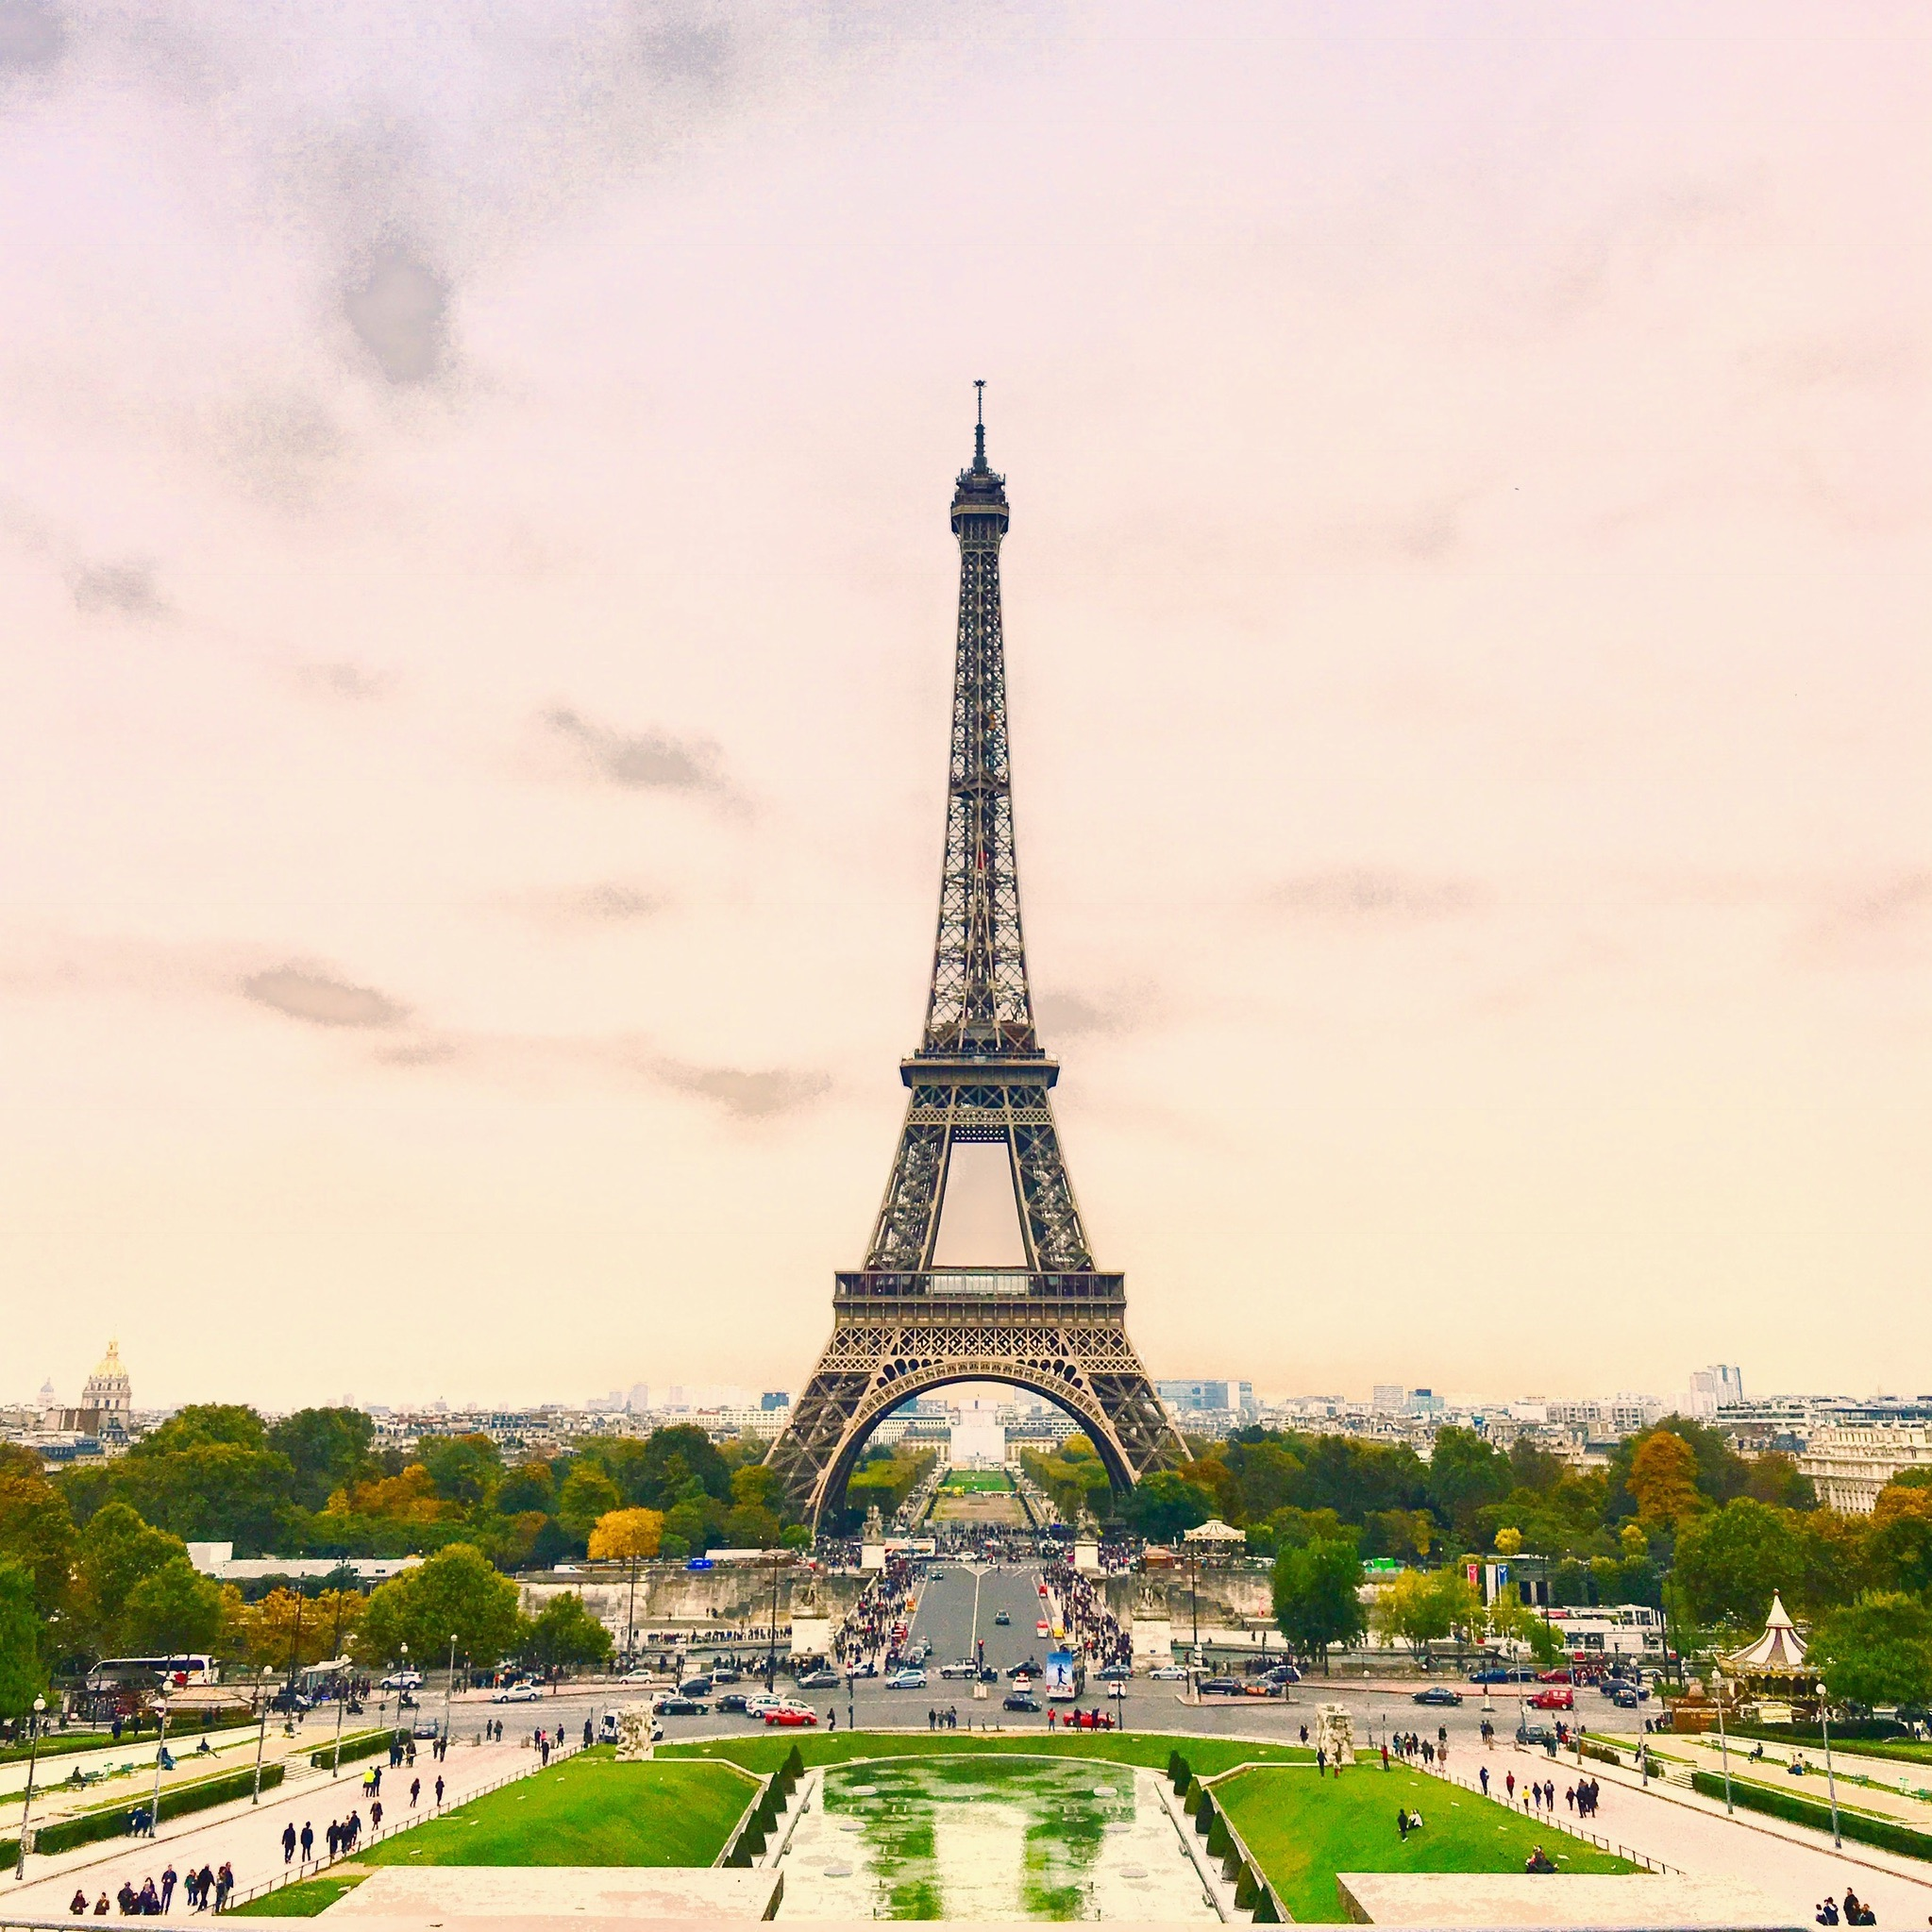 paris-eiffelturm-tour-eiffel-hauptstadt-frankreich-travel-blog